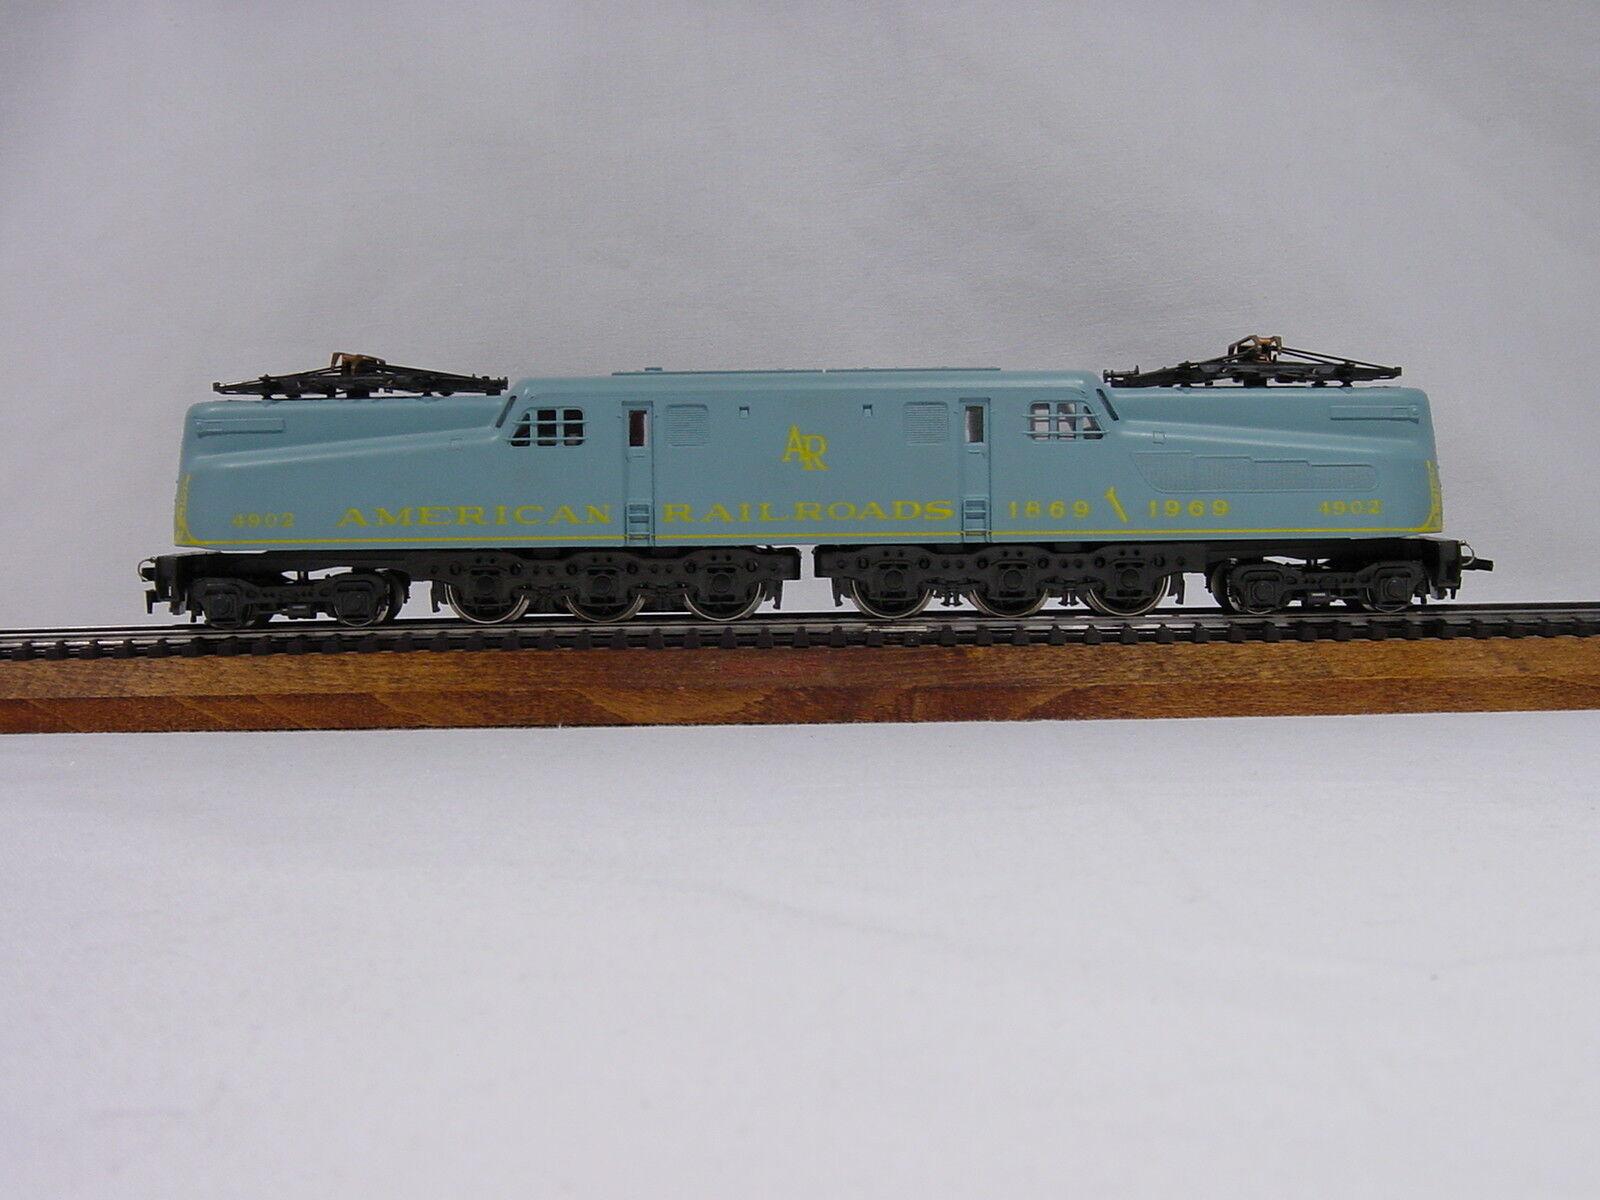 Rivarossi 5163 - GG 1 4902 Golden Spike American Railroads (Ri 02)  | Sorgfältig ausgewählte Materialien